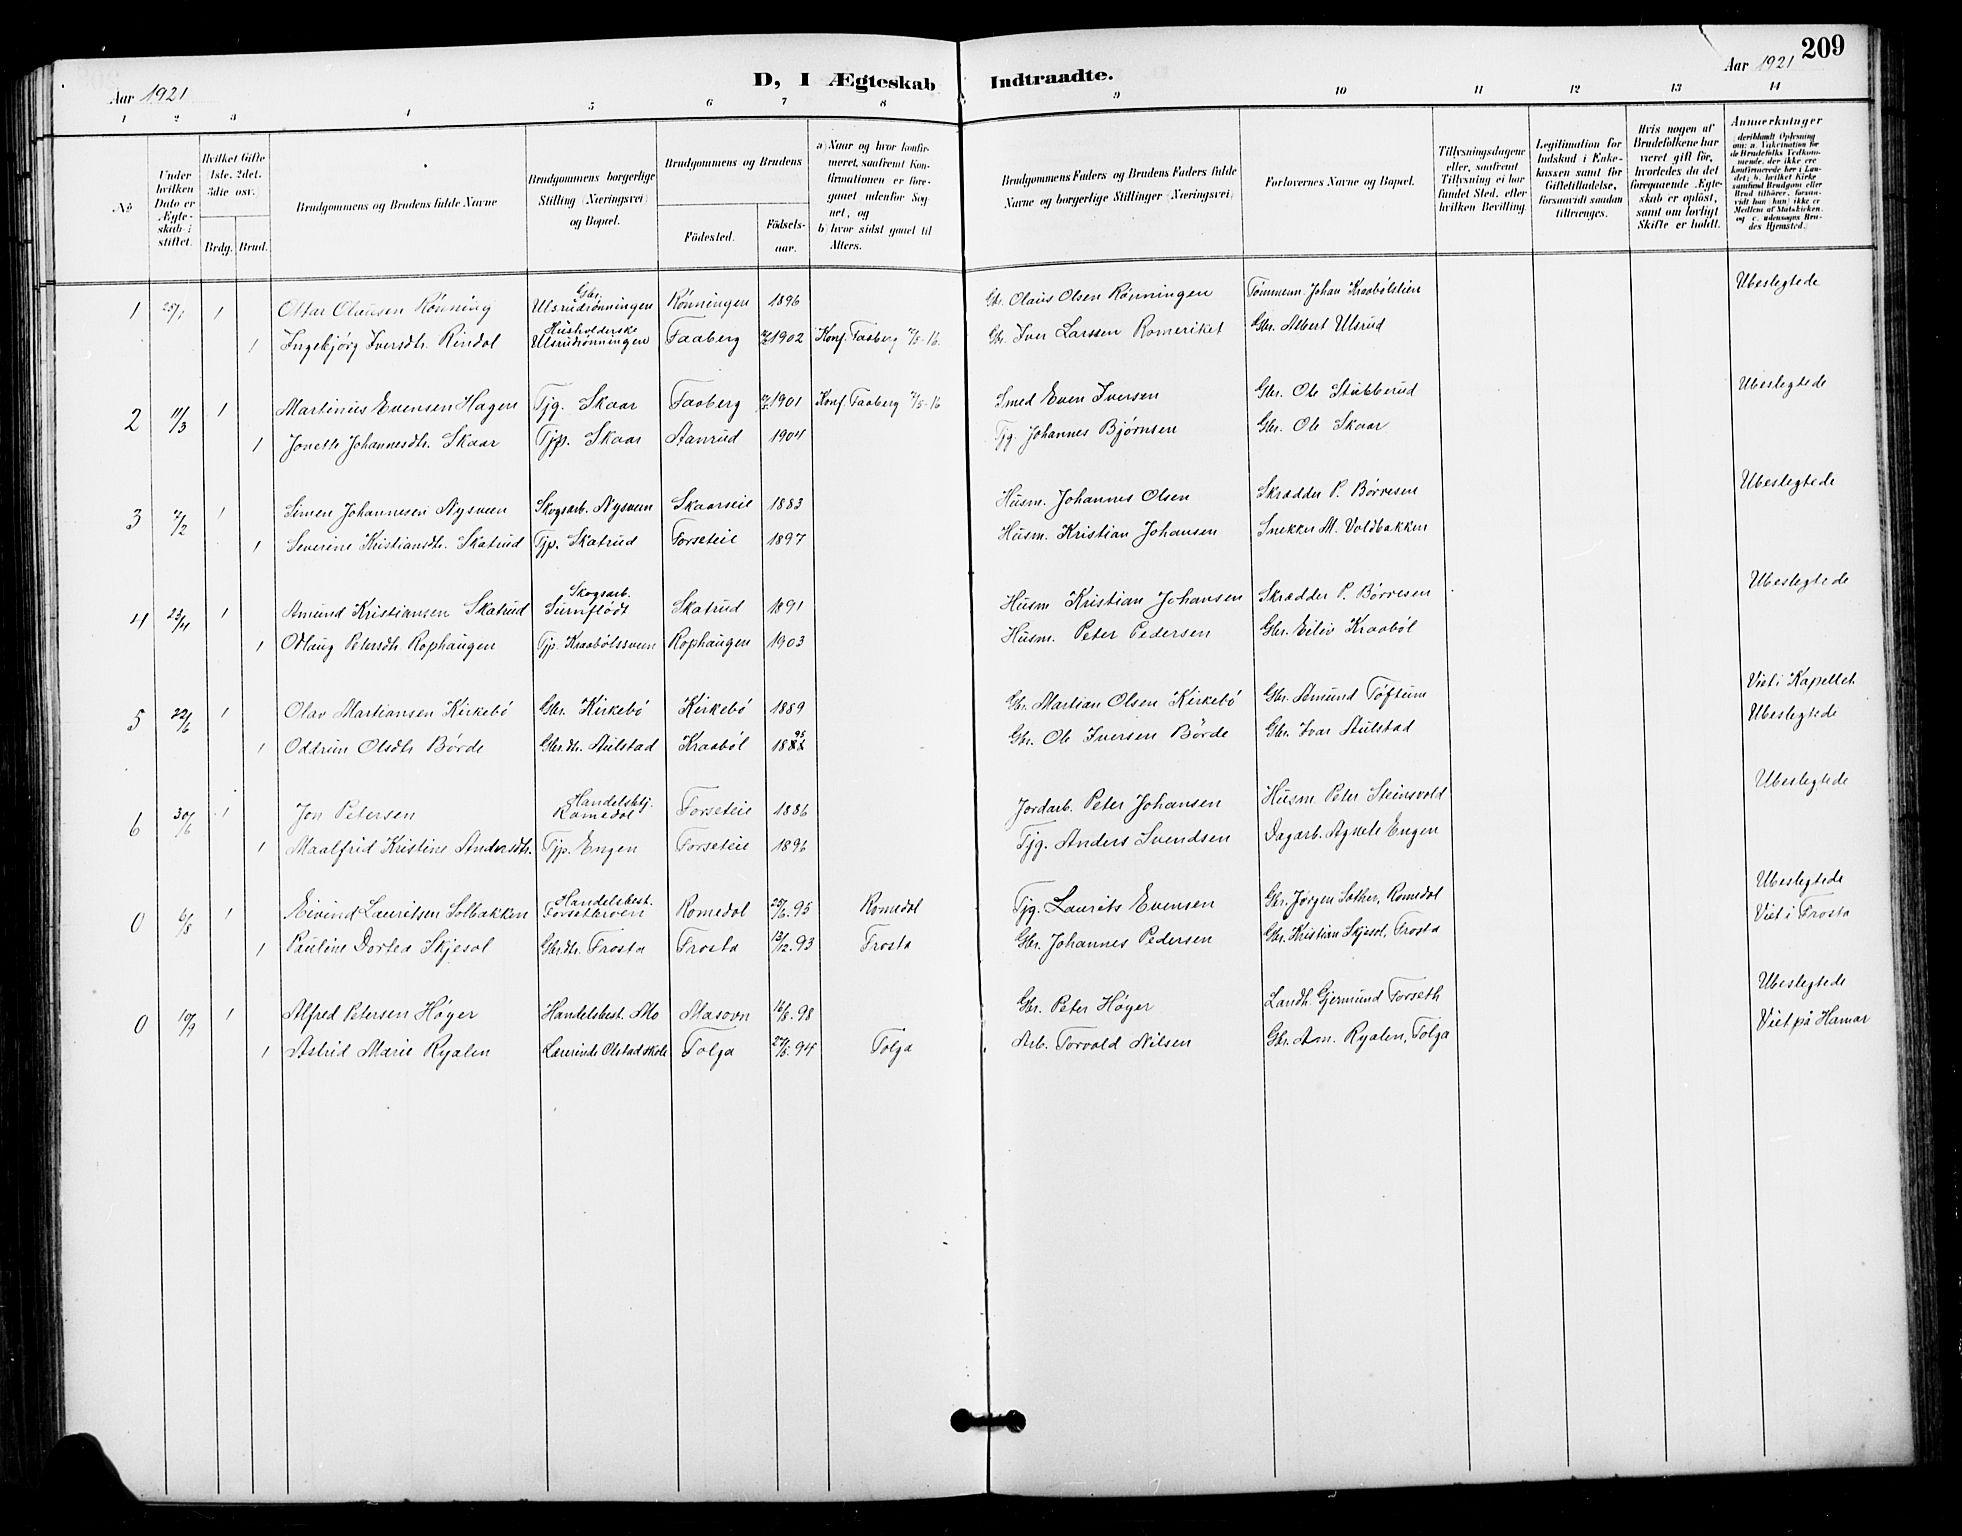 SAH, Vestre Gausdal prestekontor, Klokkerbok nr. 3, 1896-1925, s. 209